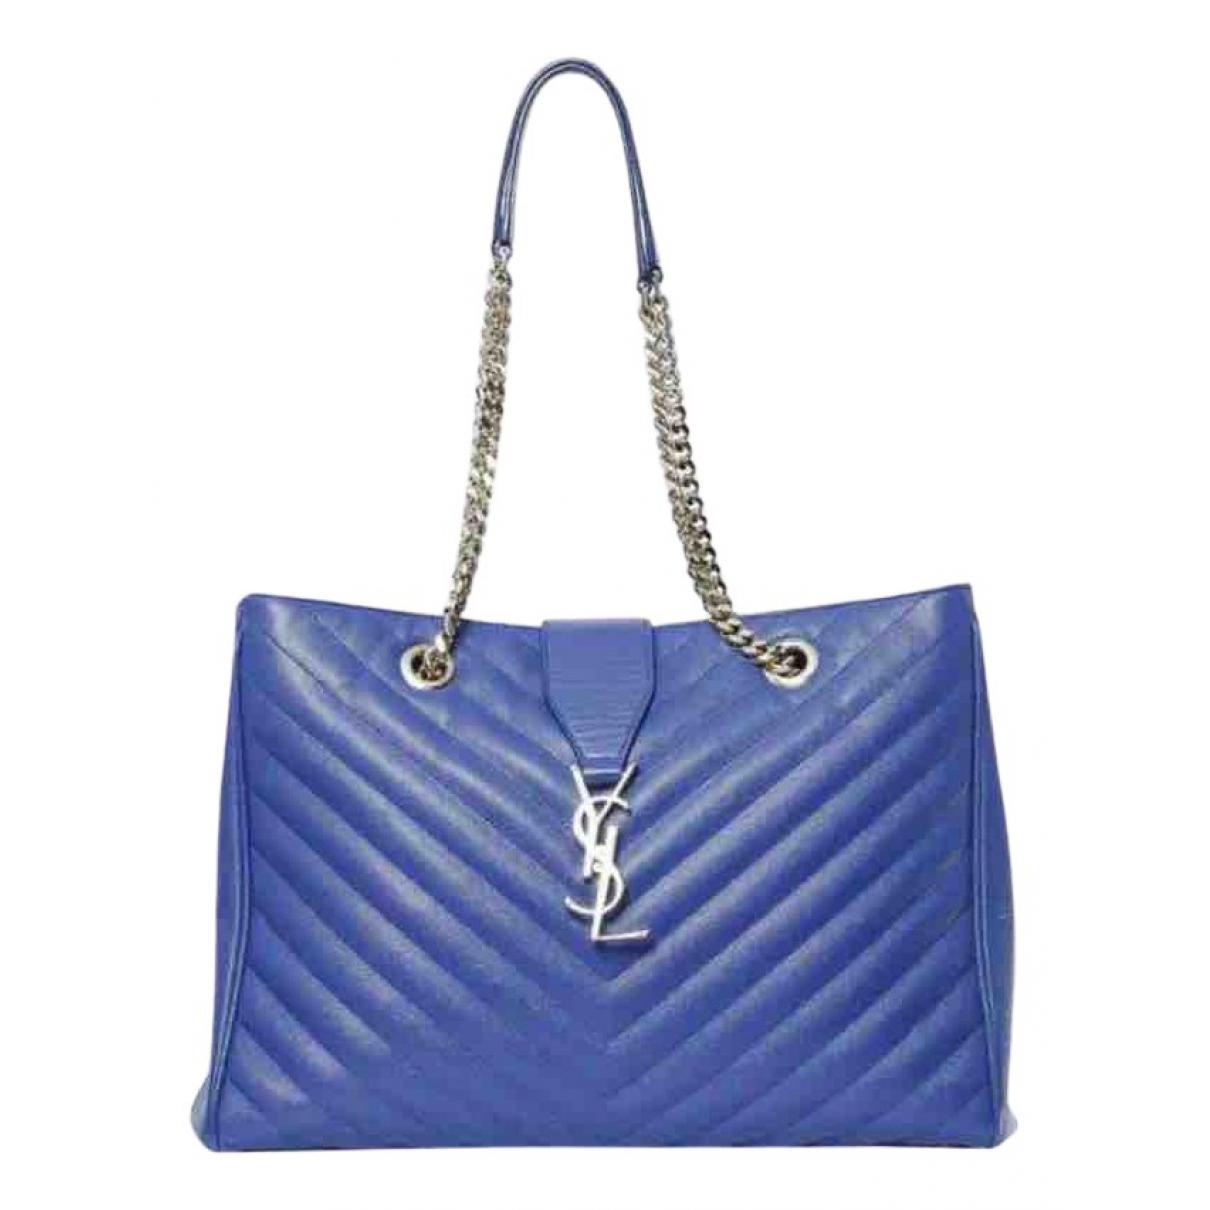 Saint Laurent - Sac a main Shopping monogramme pour femme en cuir - bleu